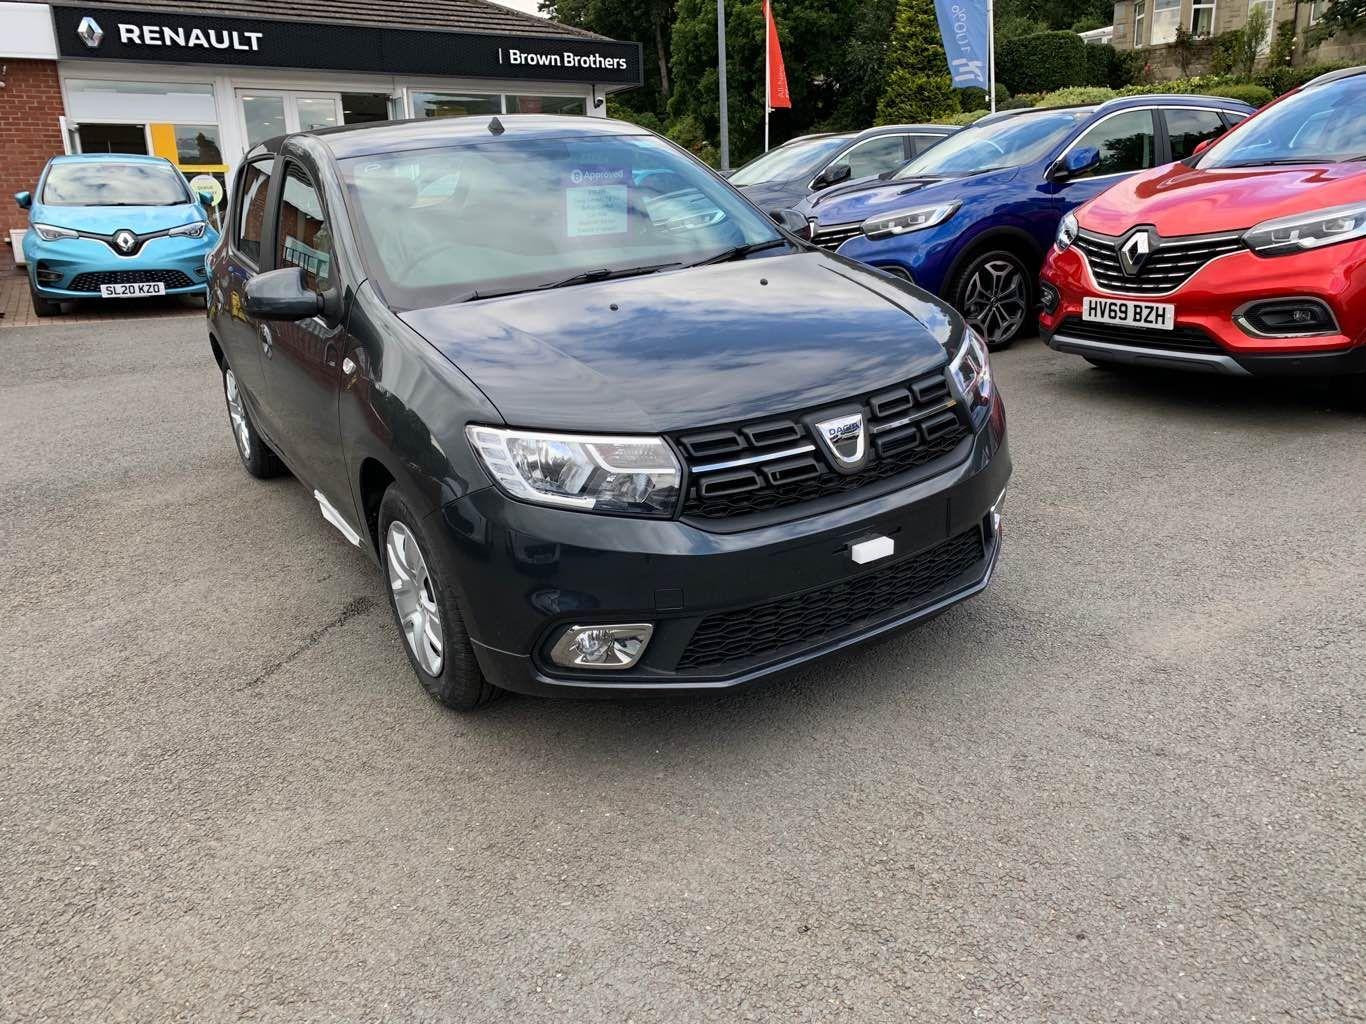 Dacia Sandero 0.9 TCe Comfort 5dr 1(2018)